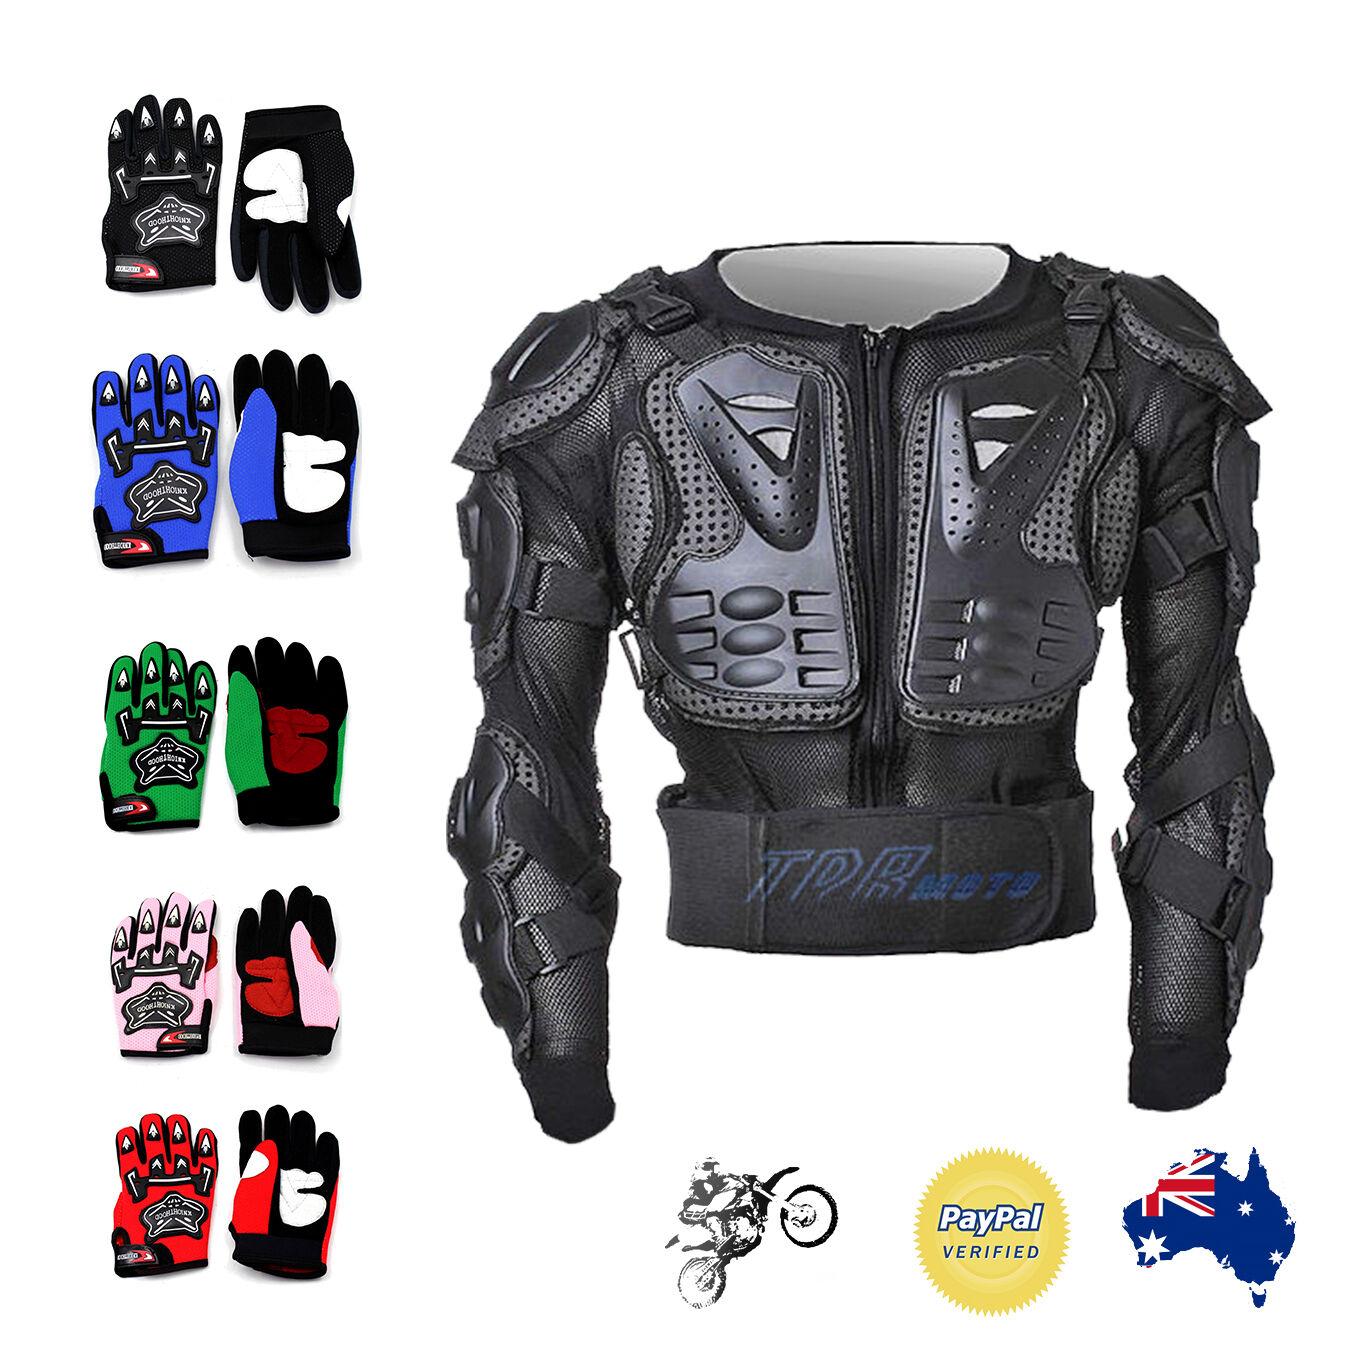 Adult KIDS BODY ARMOUR Motocross ATV Motox Downhill BMX Dirt Pit Bike Armor XMAS